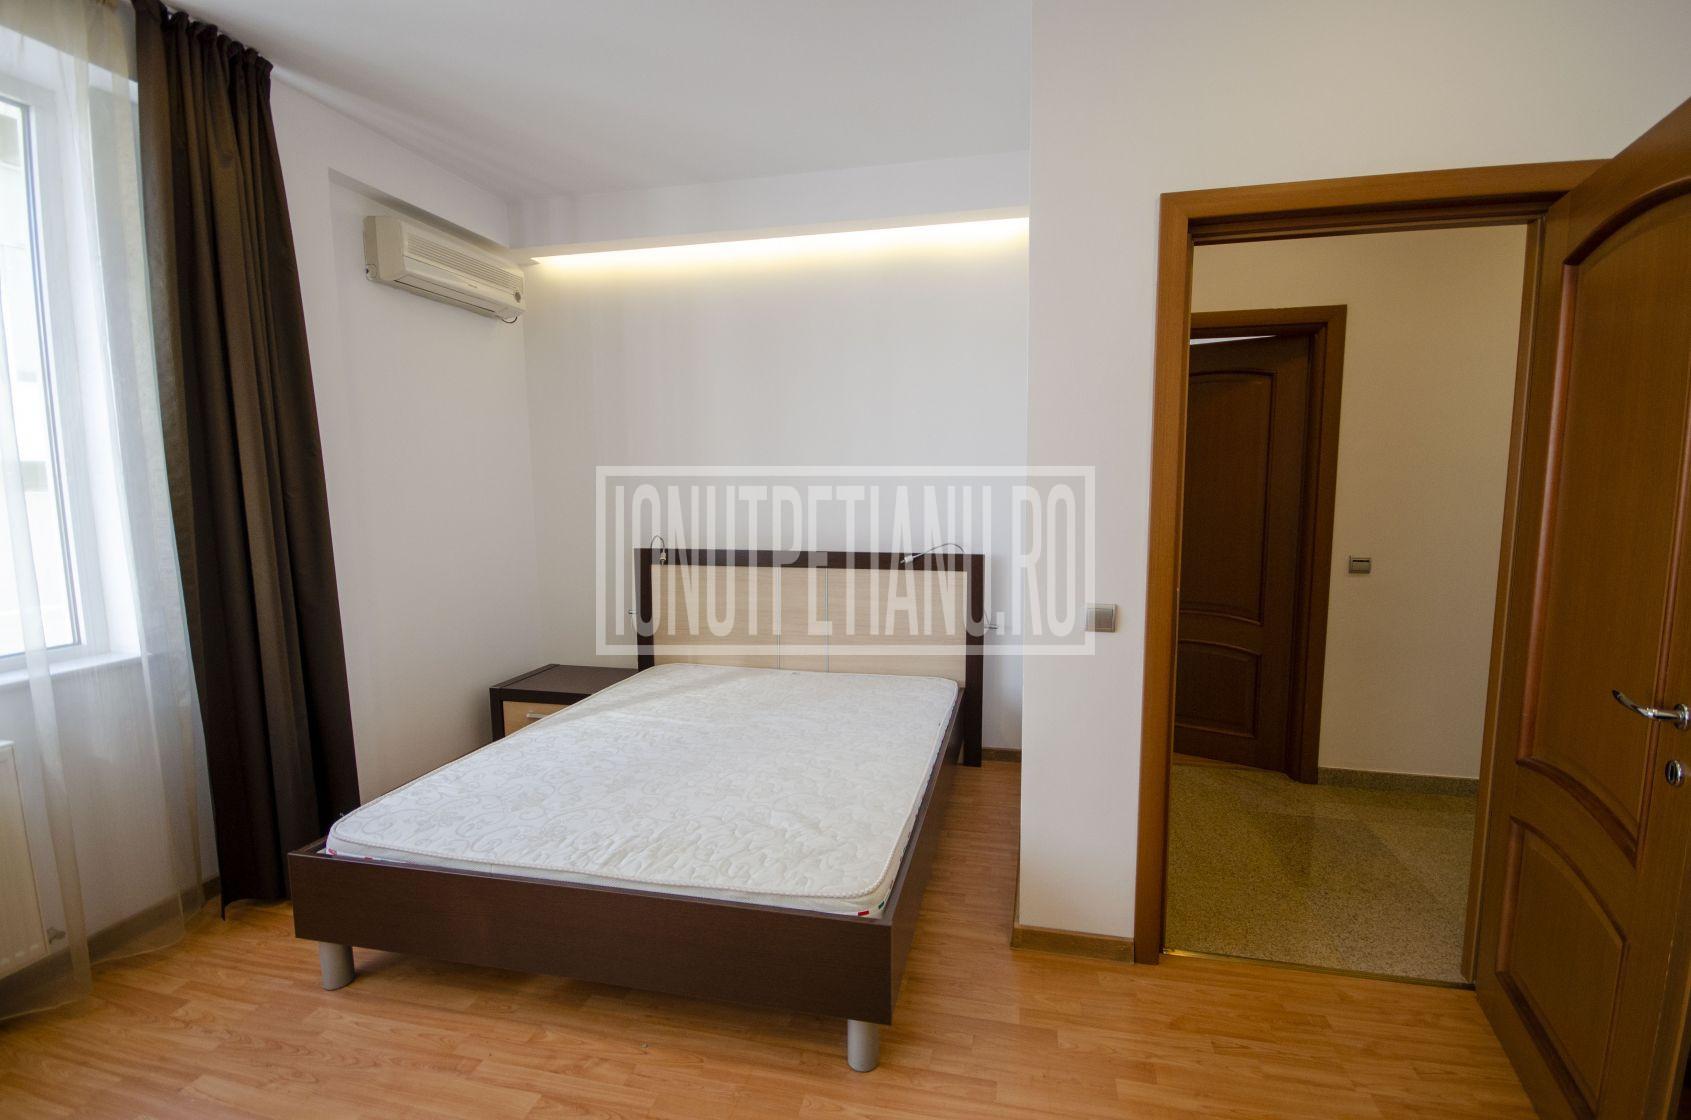 Inchiriere  apartament 3 camere cartier Primaverii